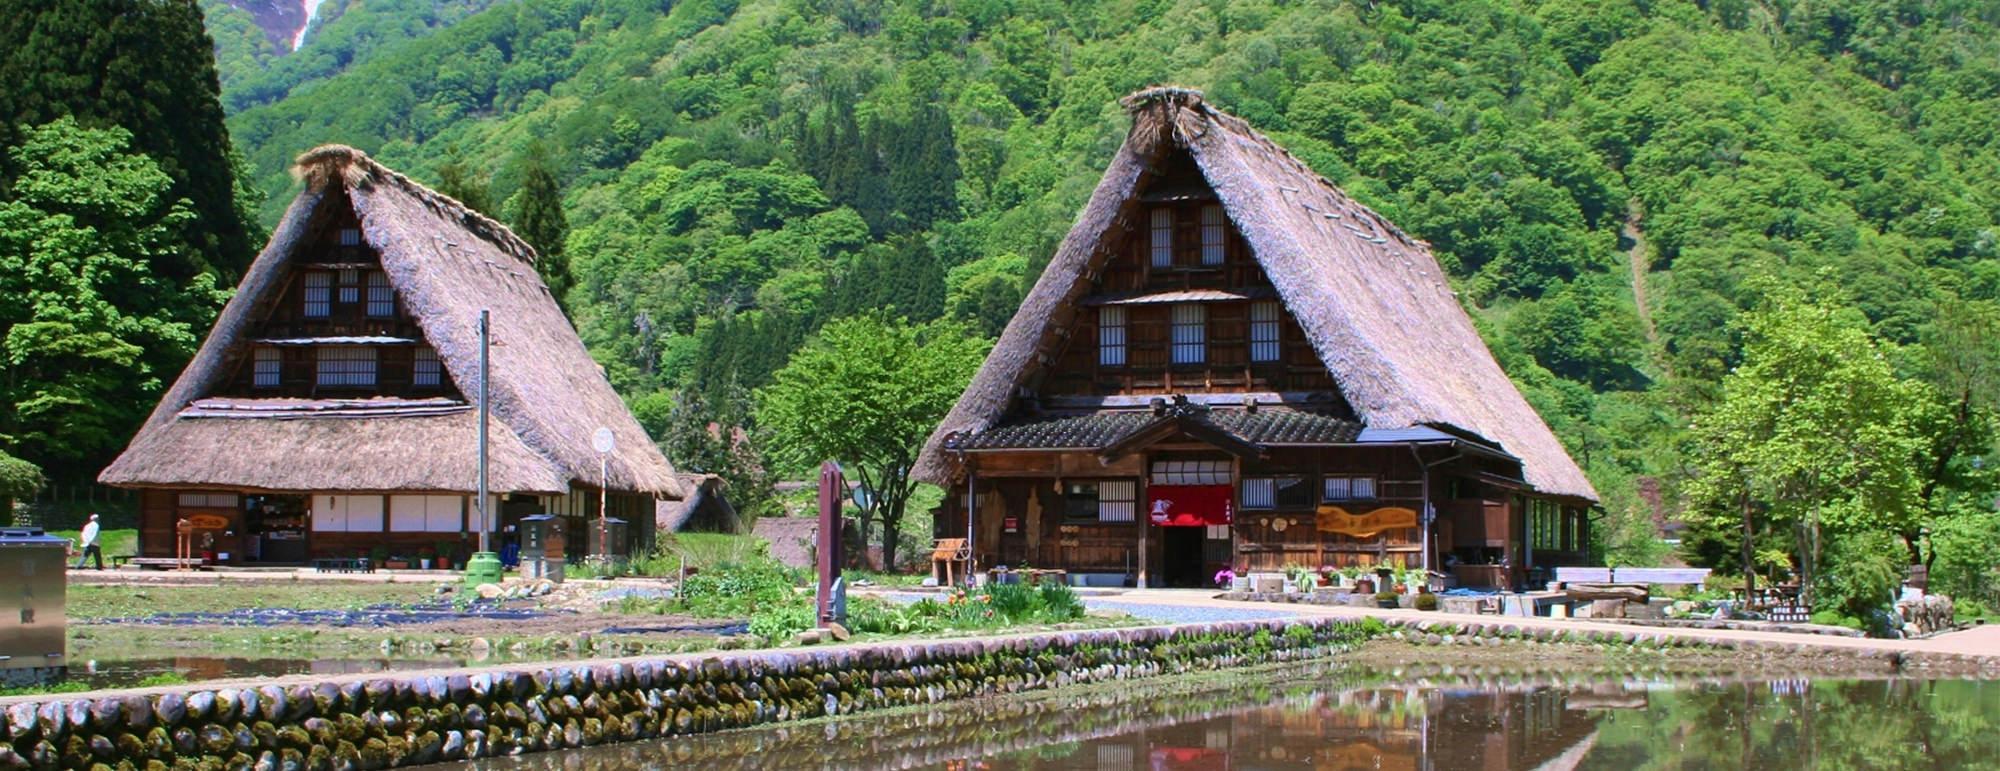 gokayama gassho-style houses - toyama | is japan cool?-travel and